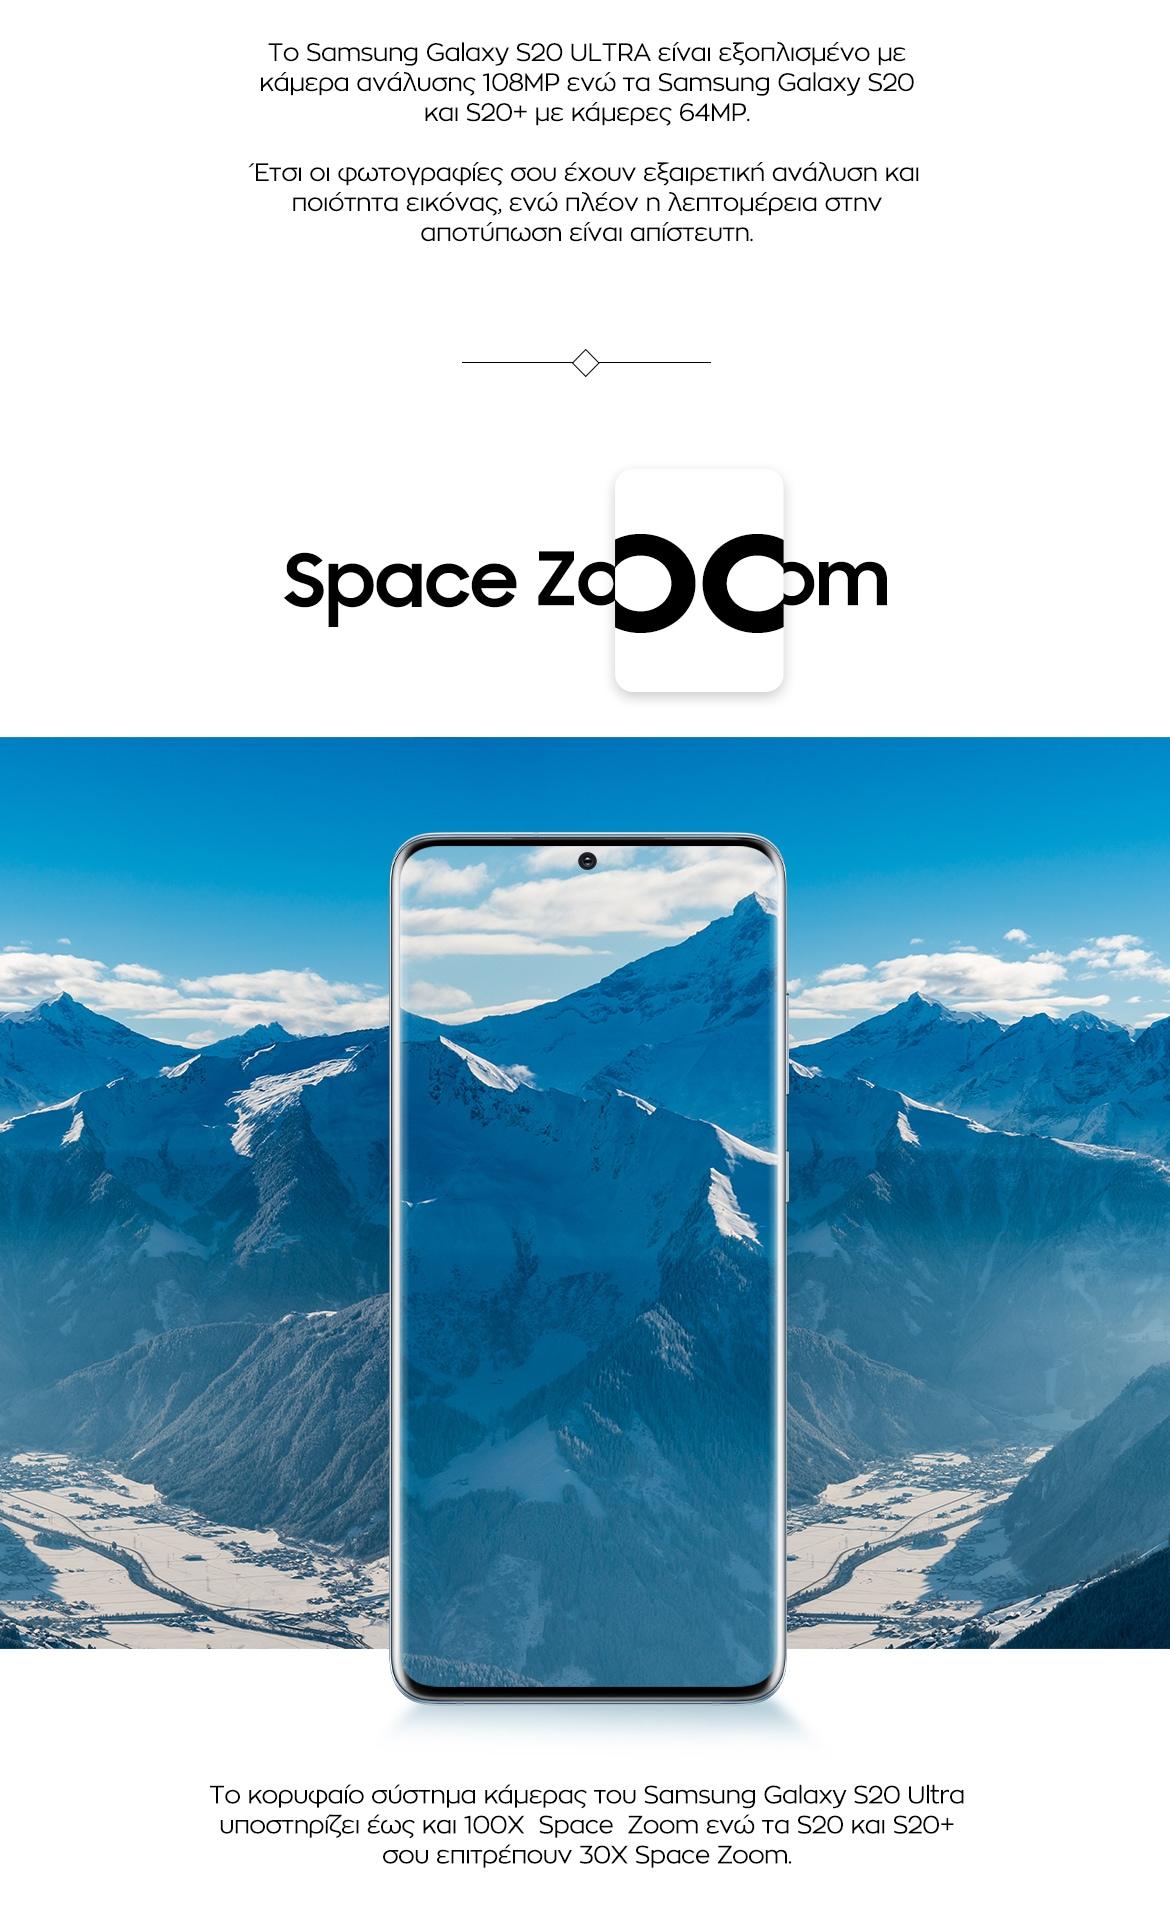 Samsung Galaxy S20 Space Zoom